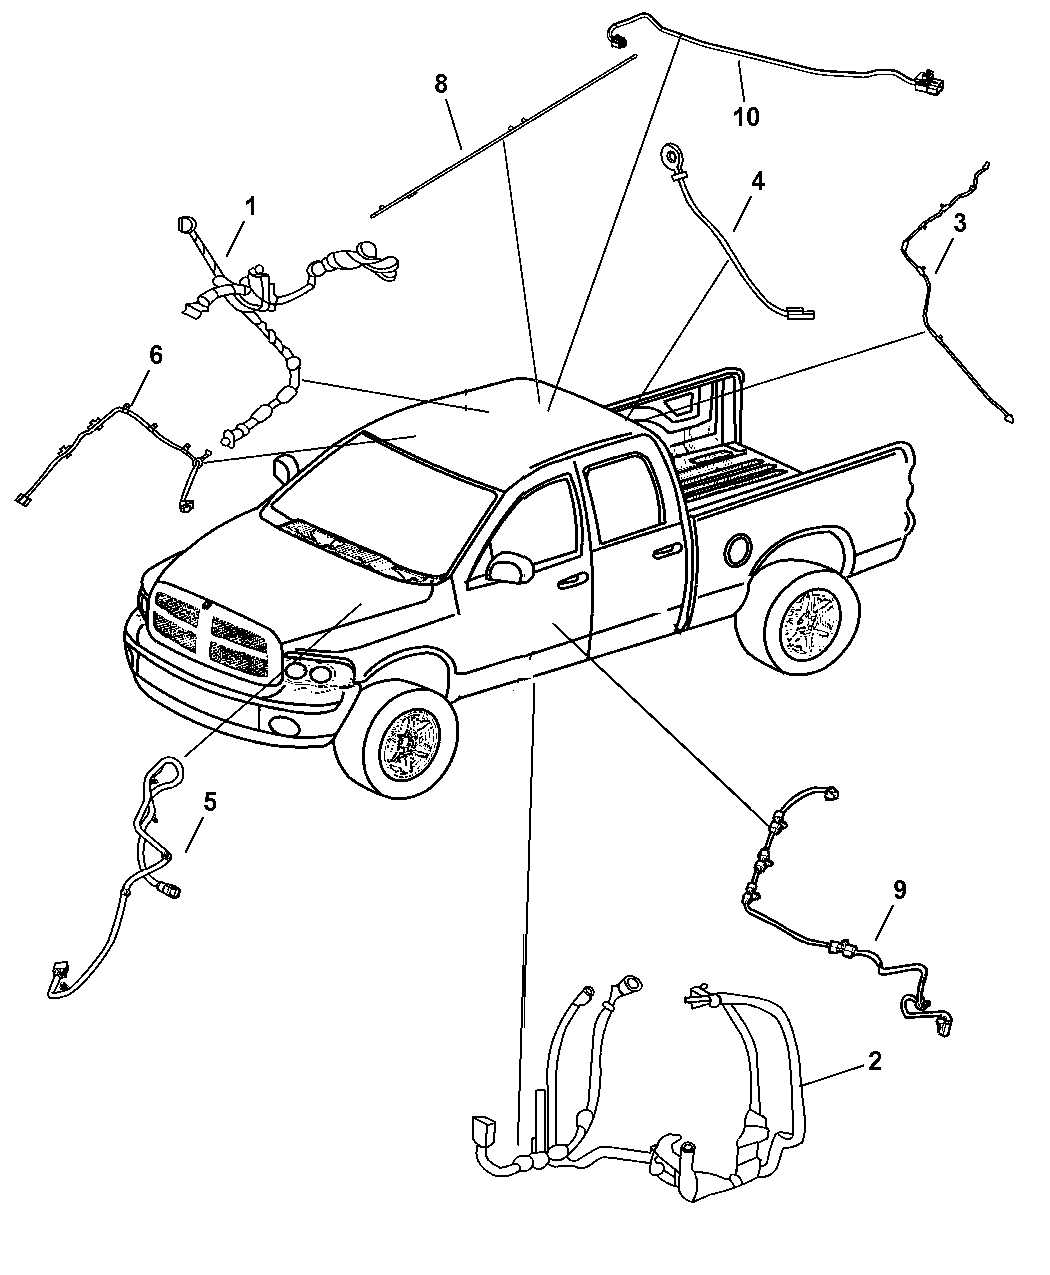 Dodge Ram 3500 Wiring Diagram Besides 1997 Dodge Ram Wiring Diagram